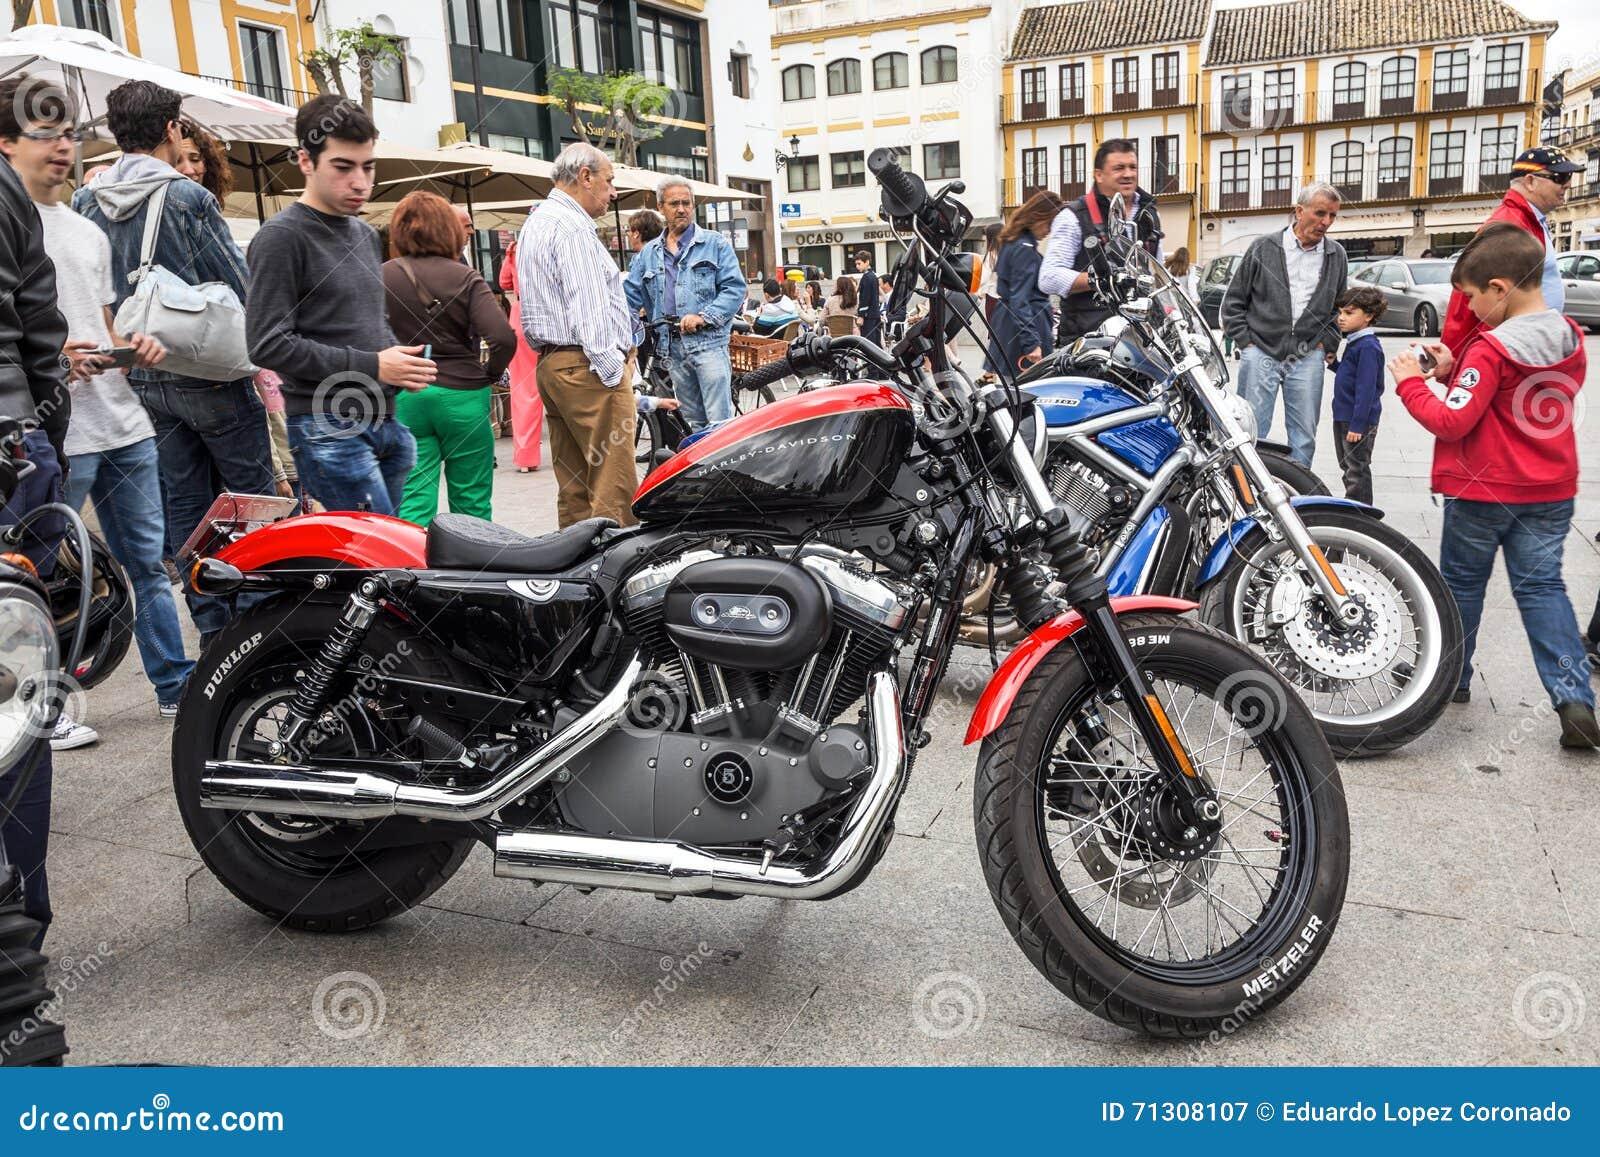 Harley Davidson motorcycles details